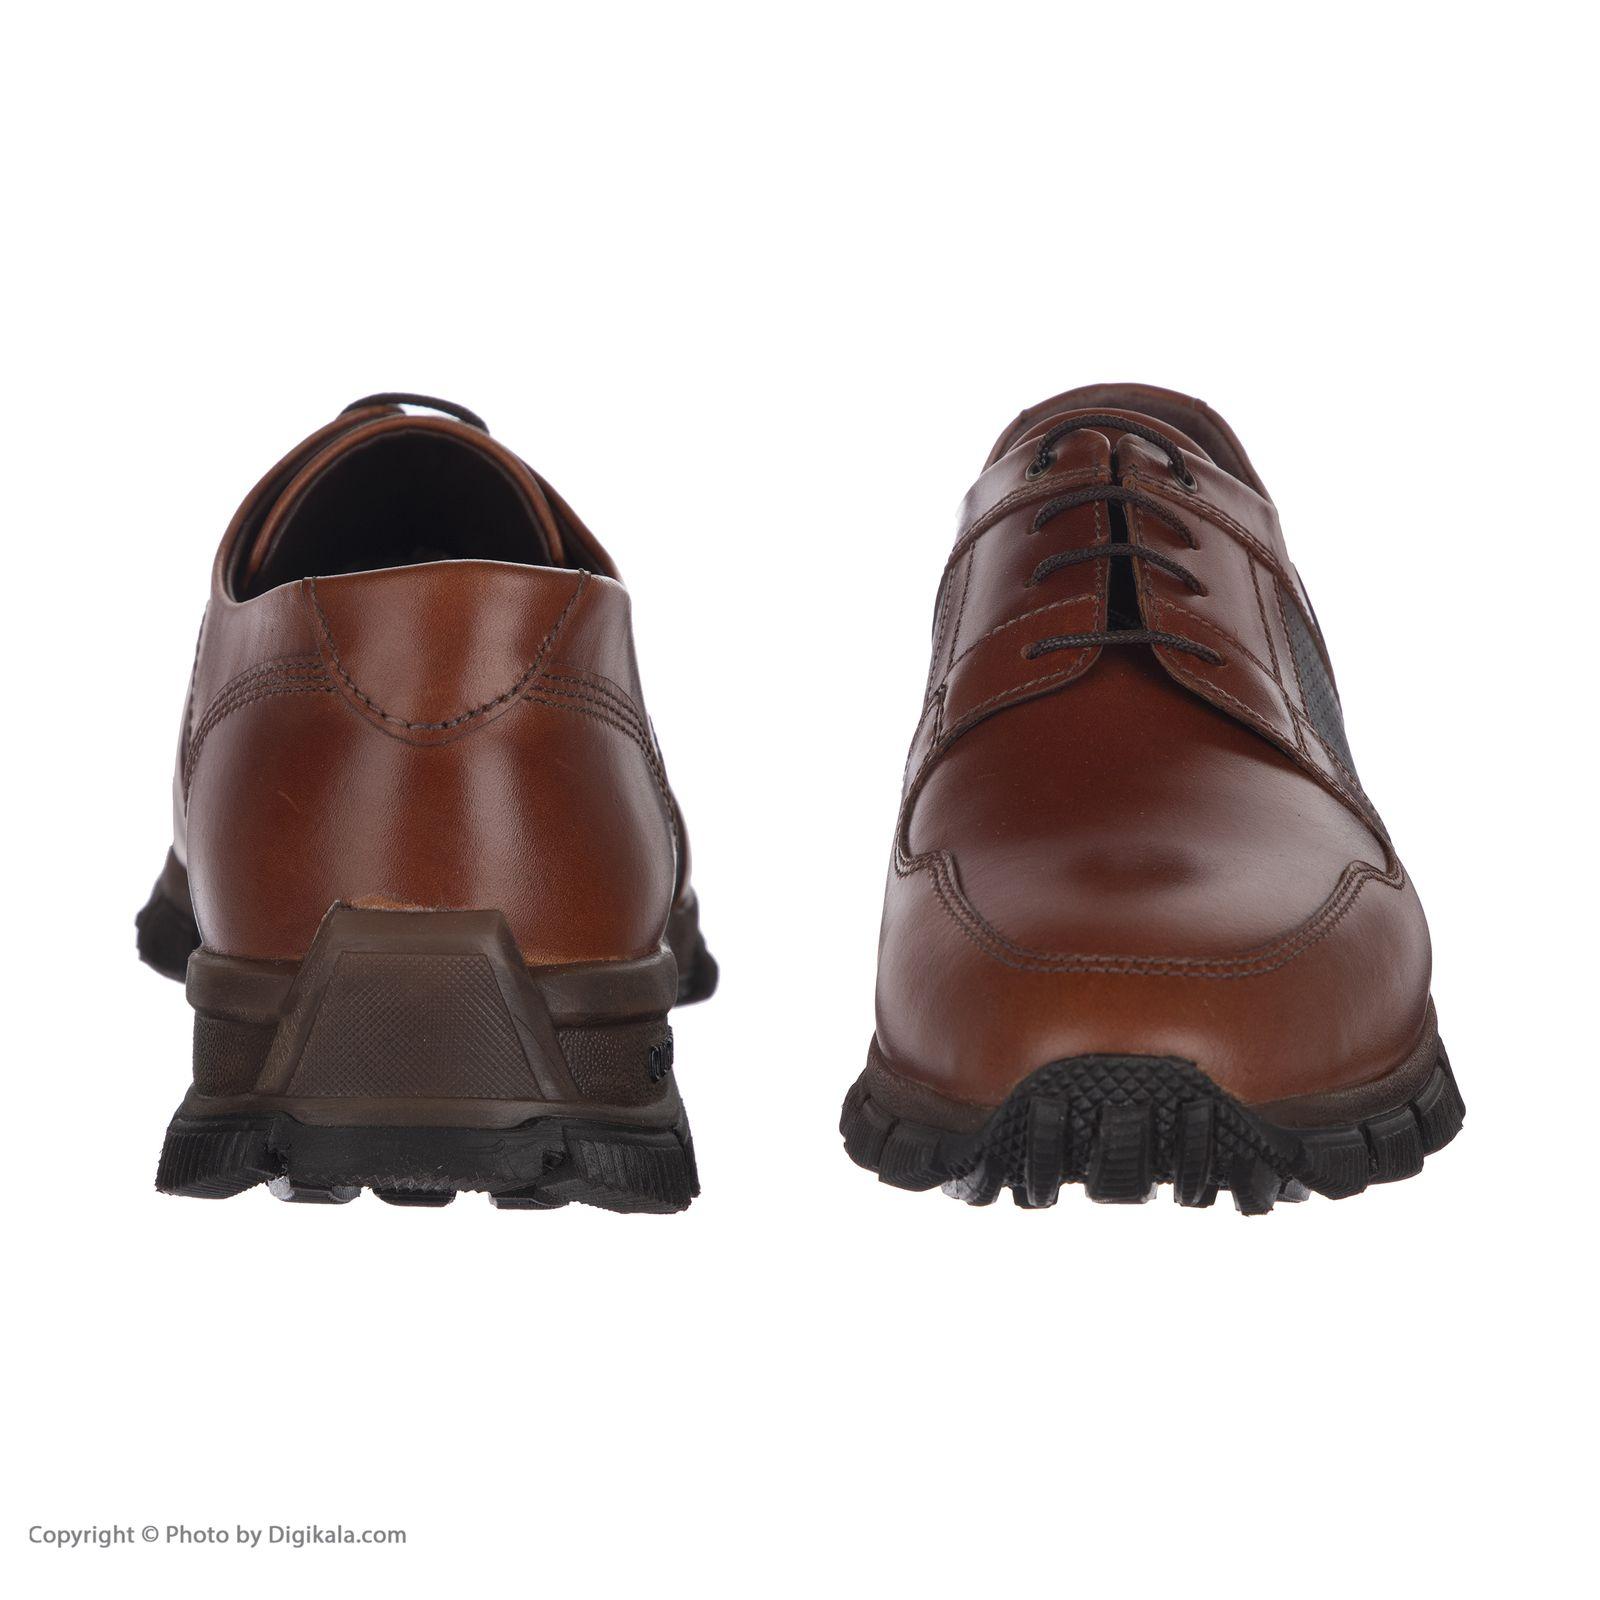 کفش روزمره مردانه دانادل مدل 8604B503136 -  - 2